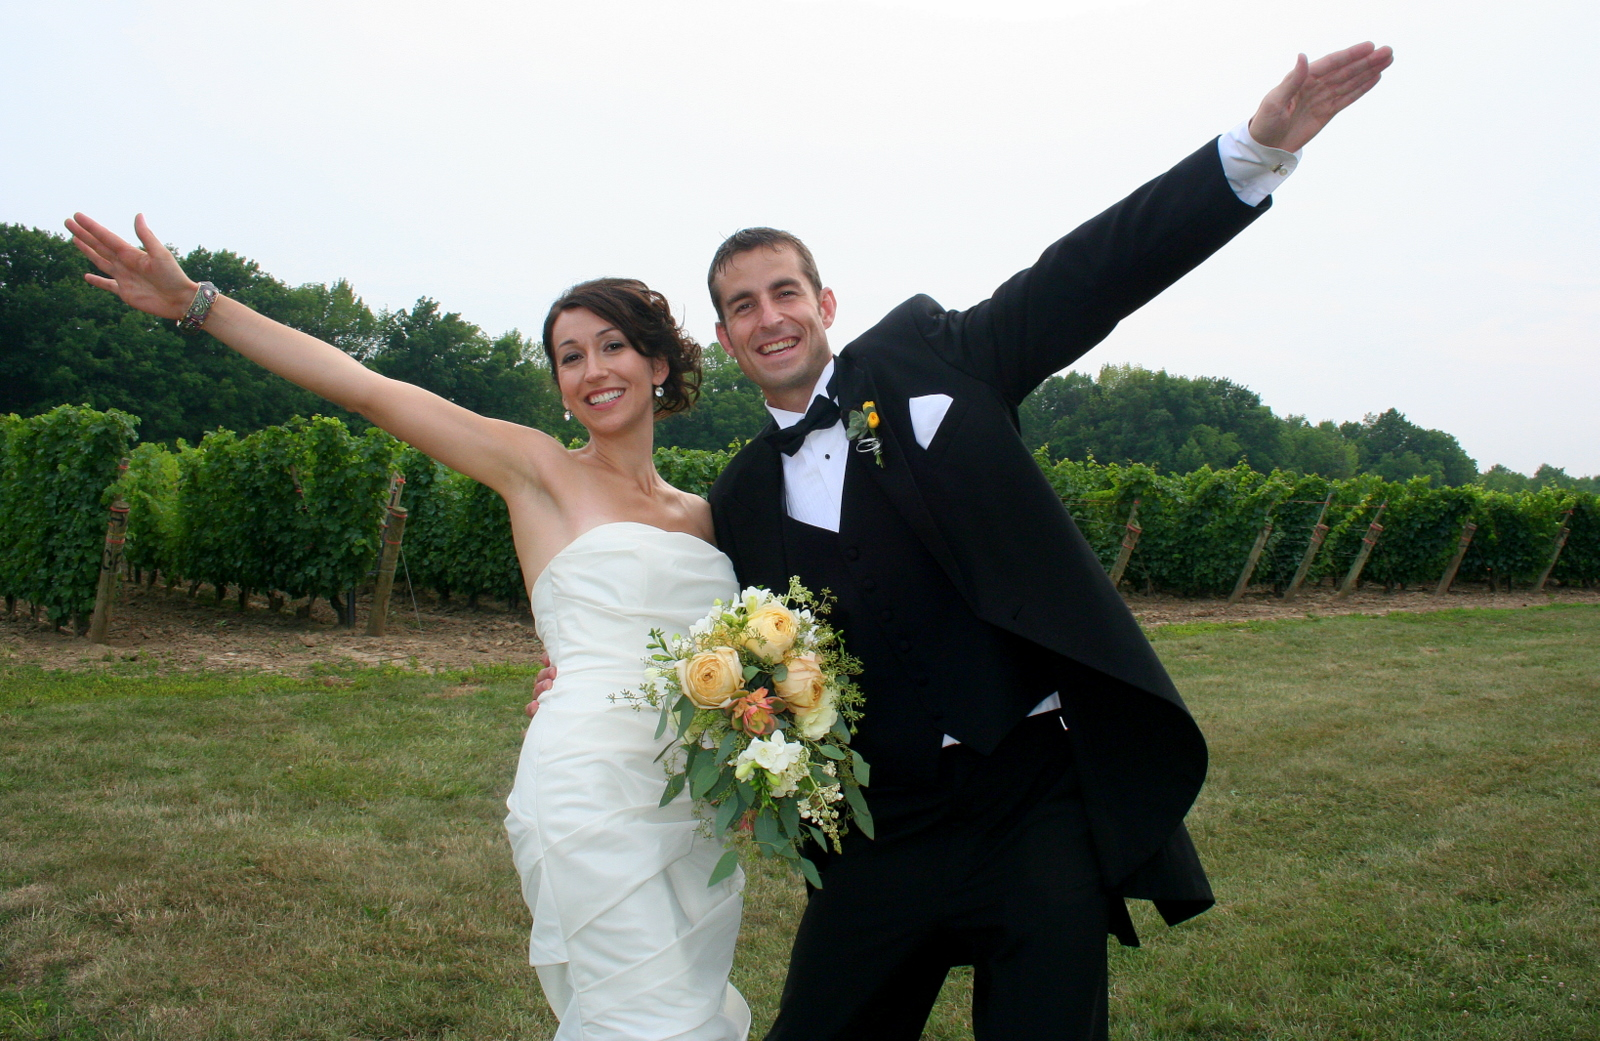 garden themed wedding that